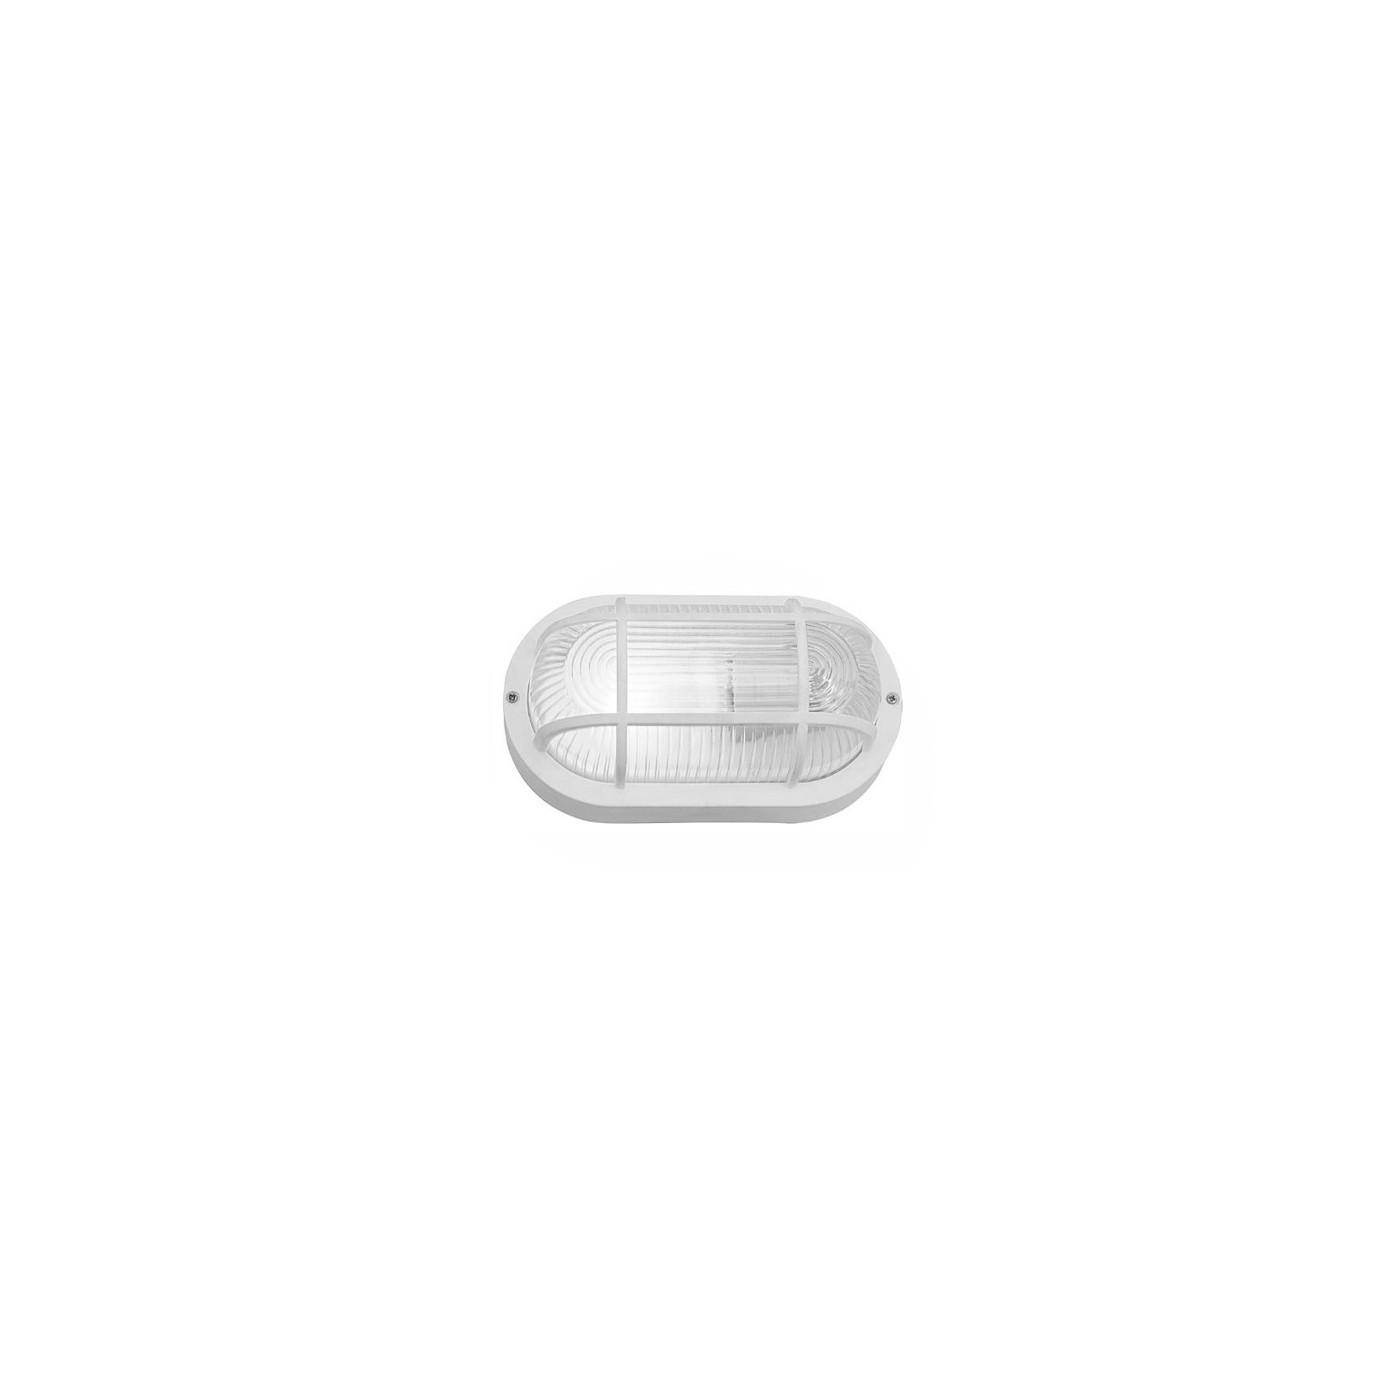 Bullseye (bulleye) lamp, witte E27, industriële look, waterdicht  - 1